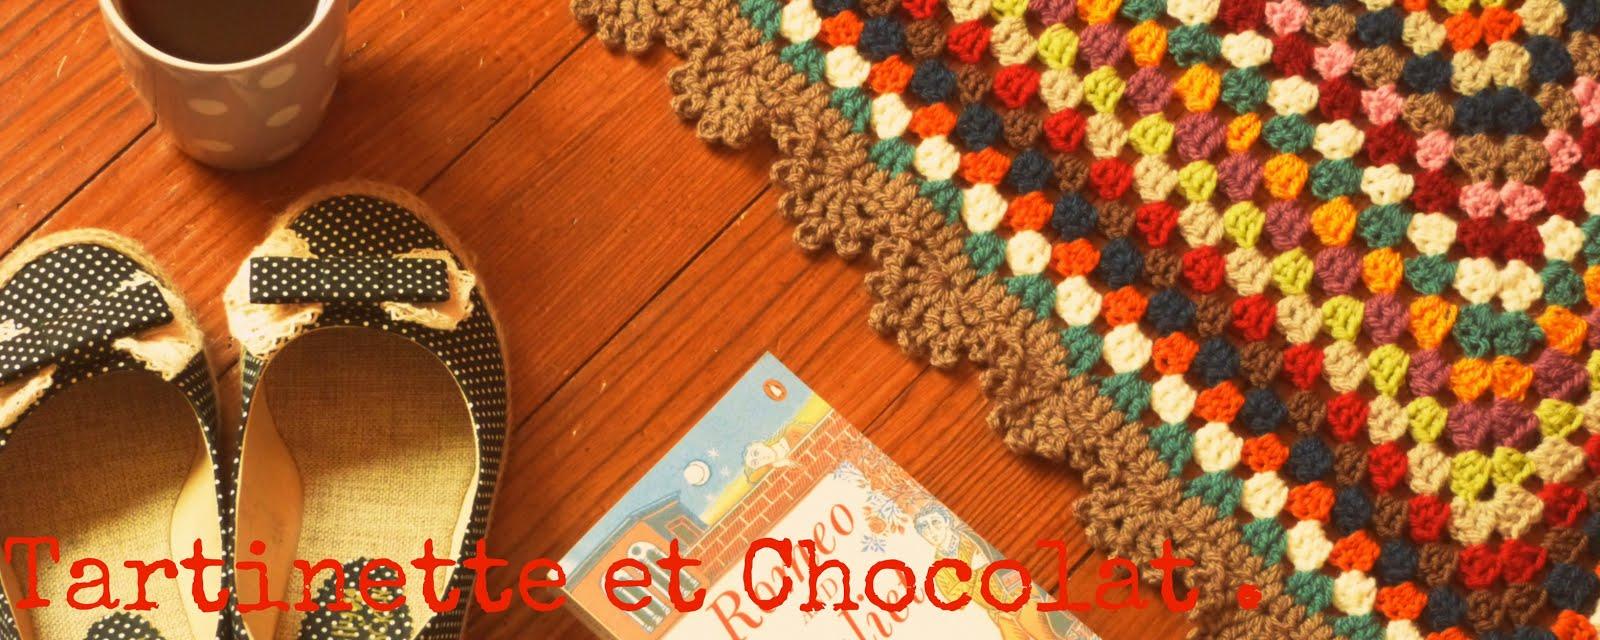 Tartinette Et Chocolat